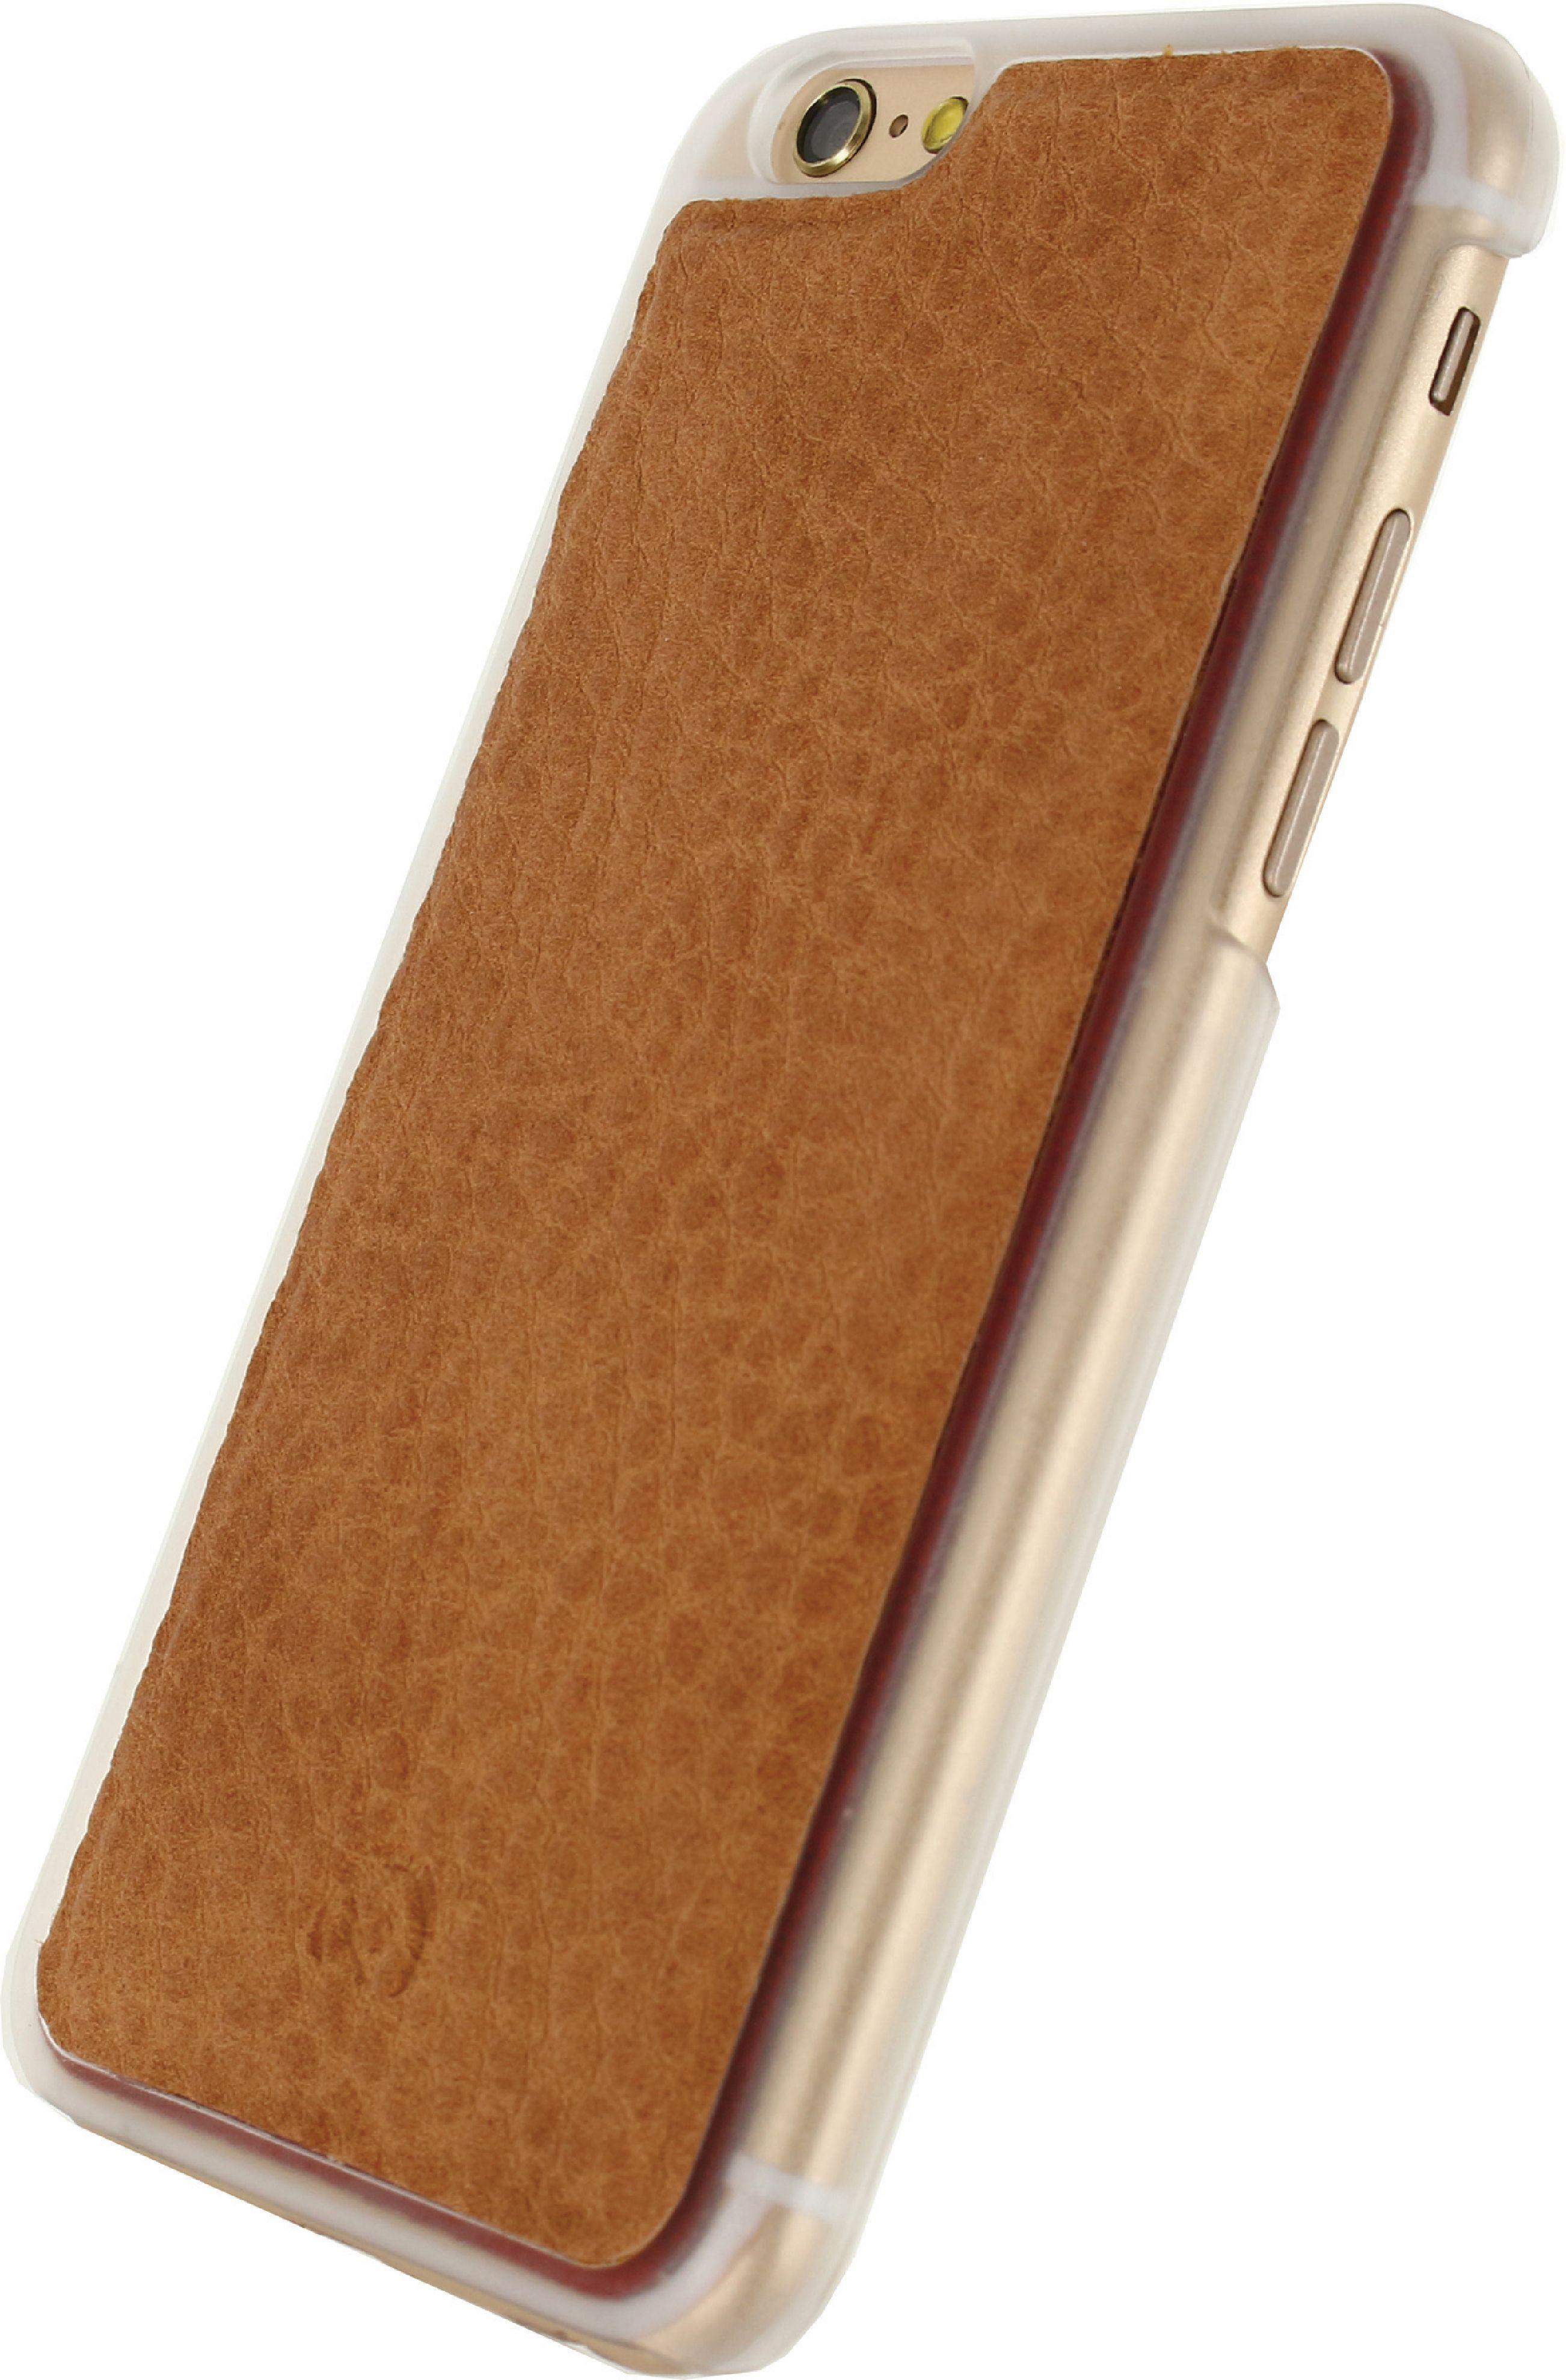 Image of   Telefon Aftageligt Lommebogsetui Apple iPhone 6 / 6s Brun